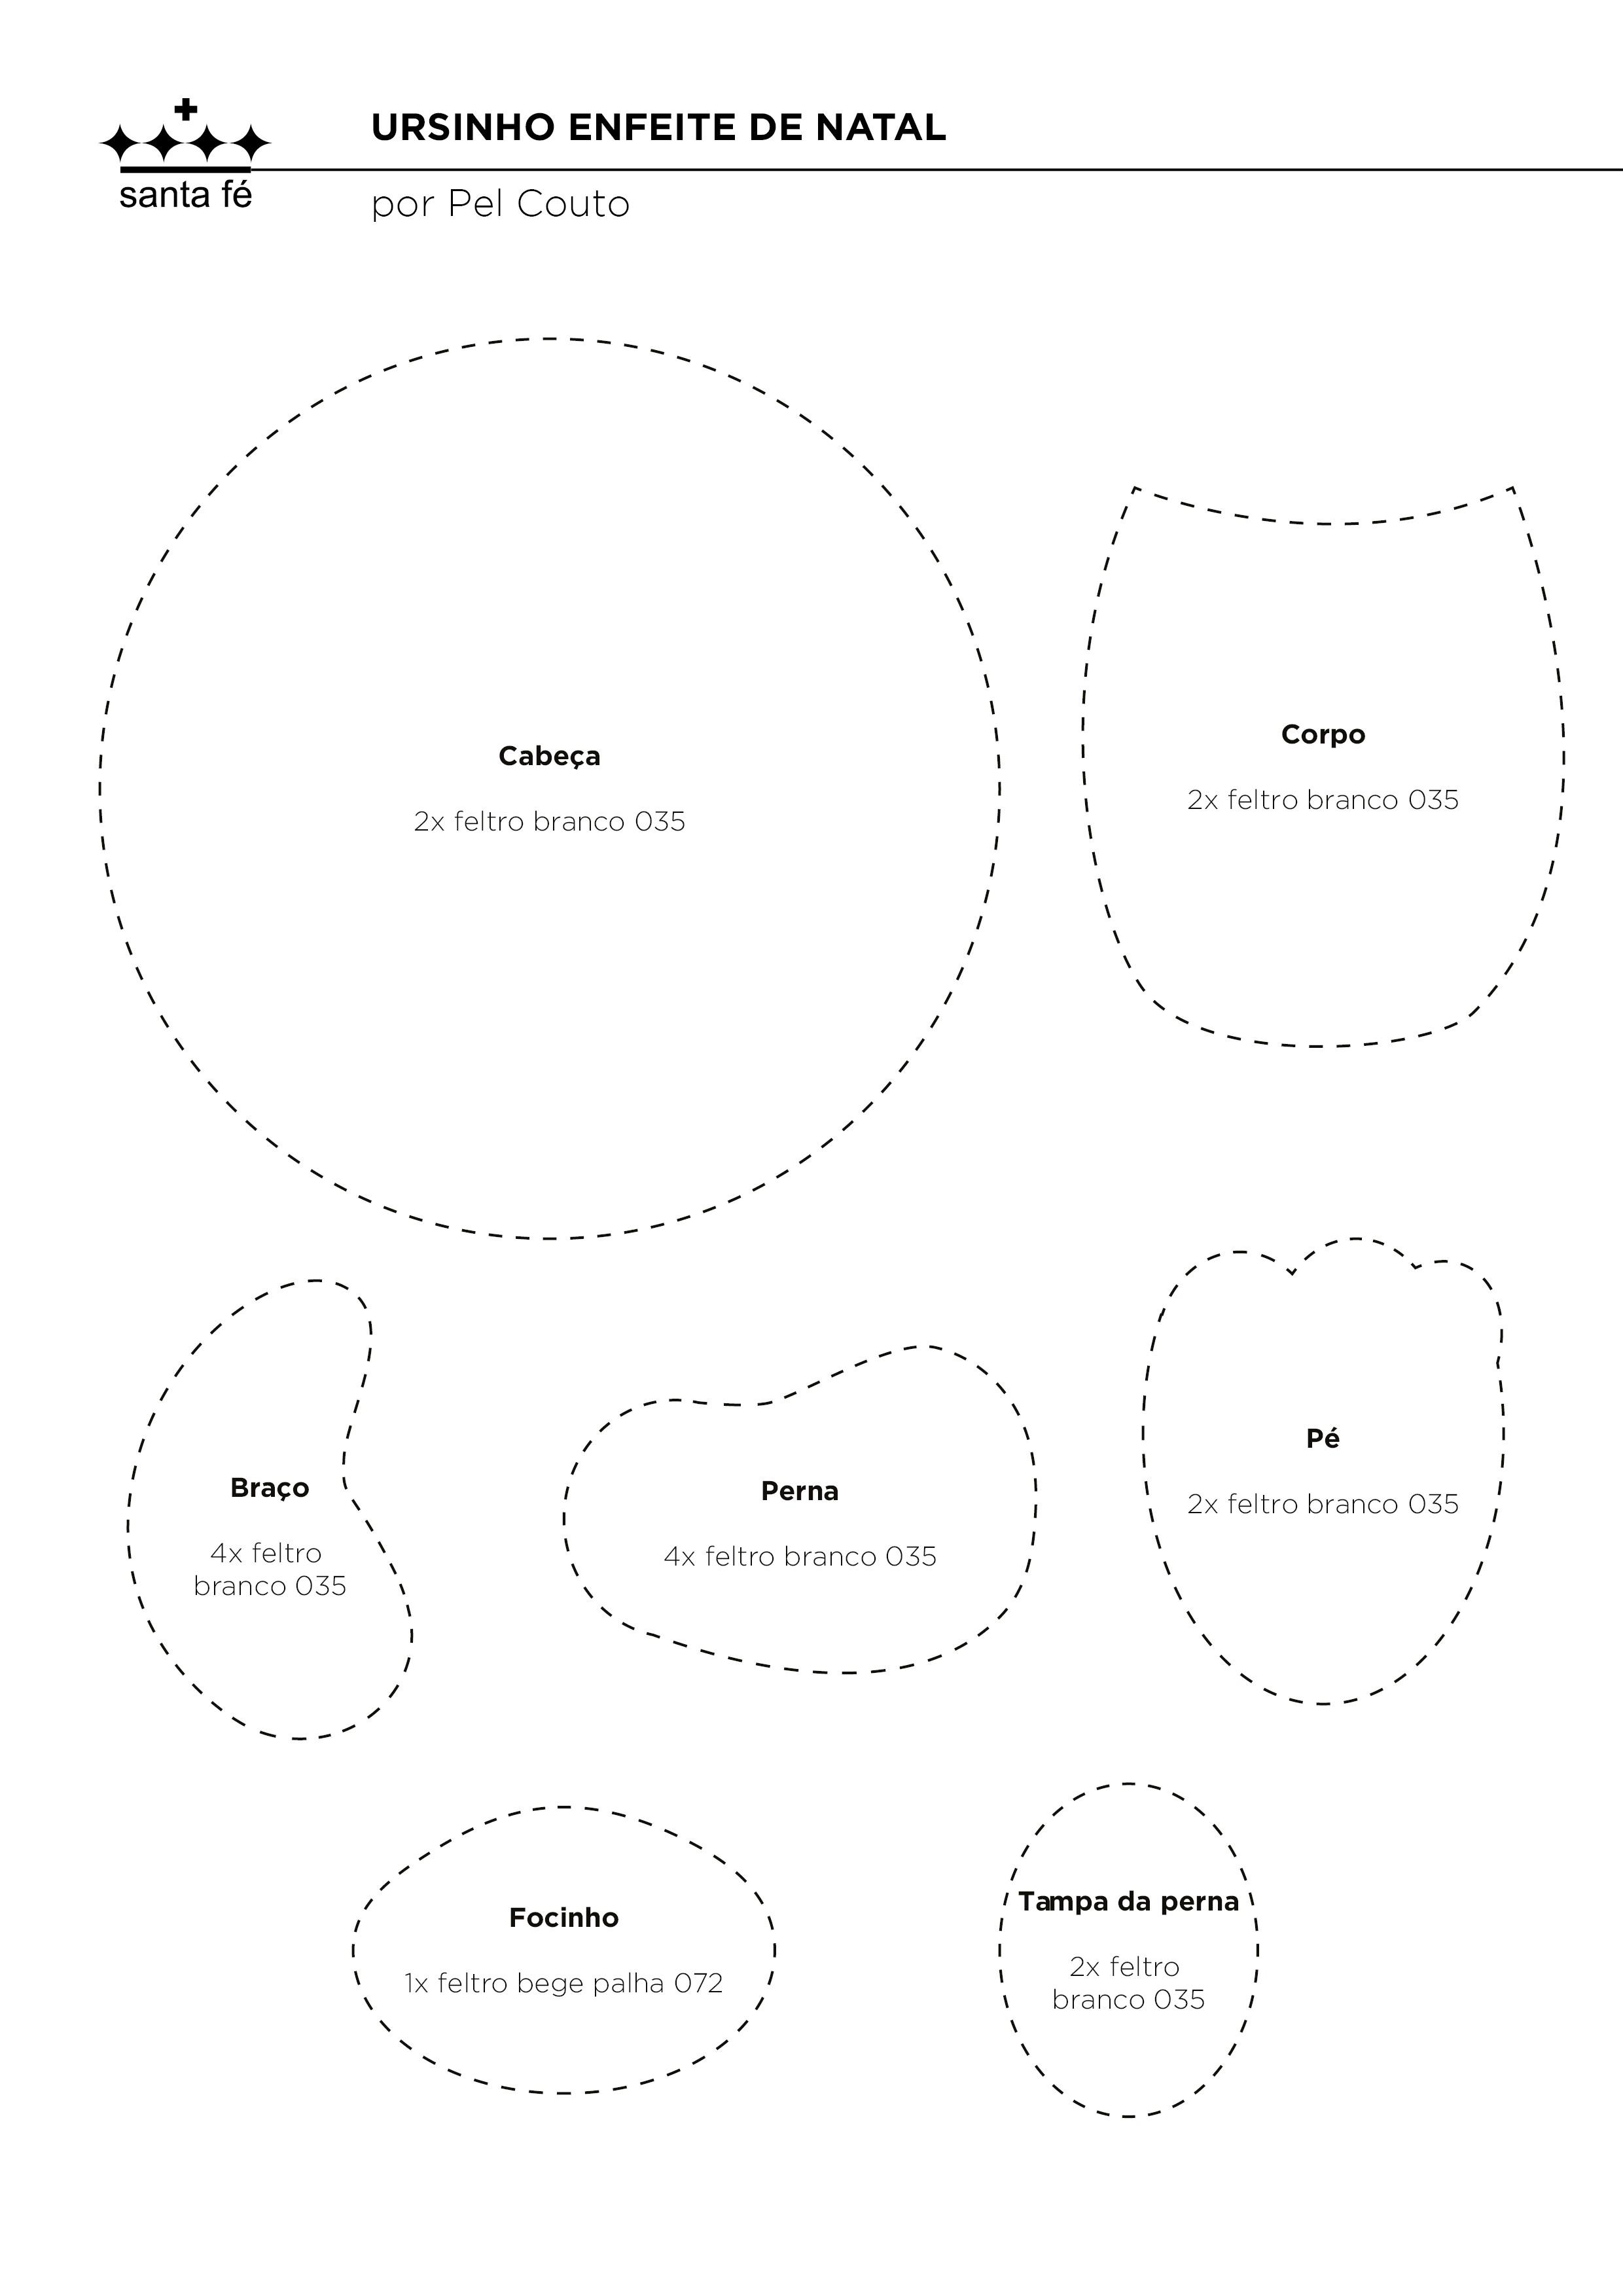 Calendario Para Imprimir 2017 Novembro Más Recientes Ursinho Enfeite De Natal Pel Couto Feltros Santa Fé Of Calendario Para Imprimir 2017 Novembro Actual 424 Best Planner Ideas Images On Pinterest